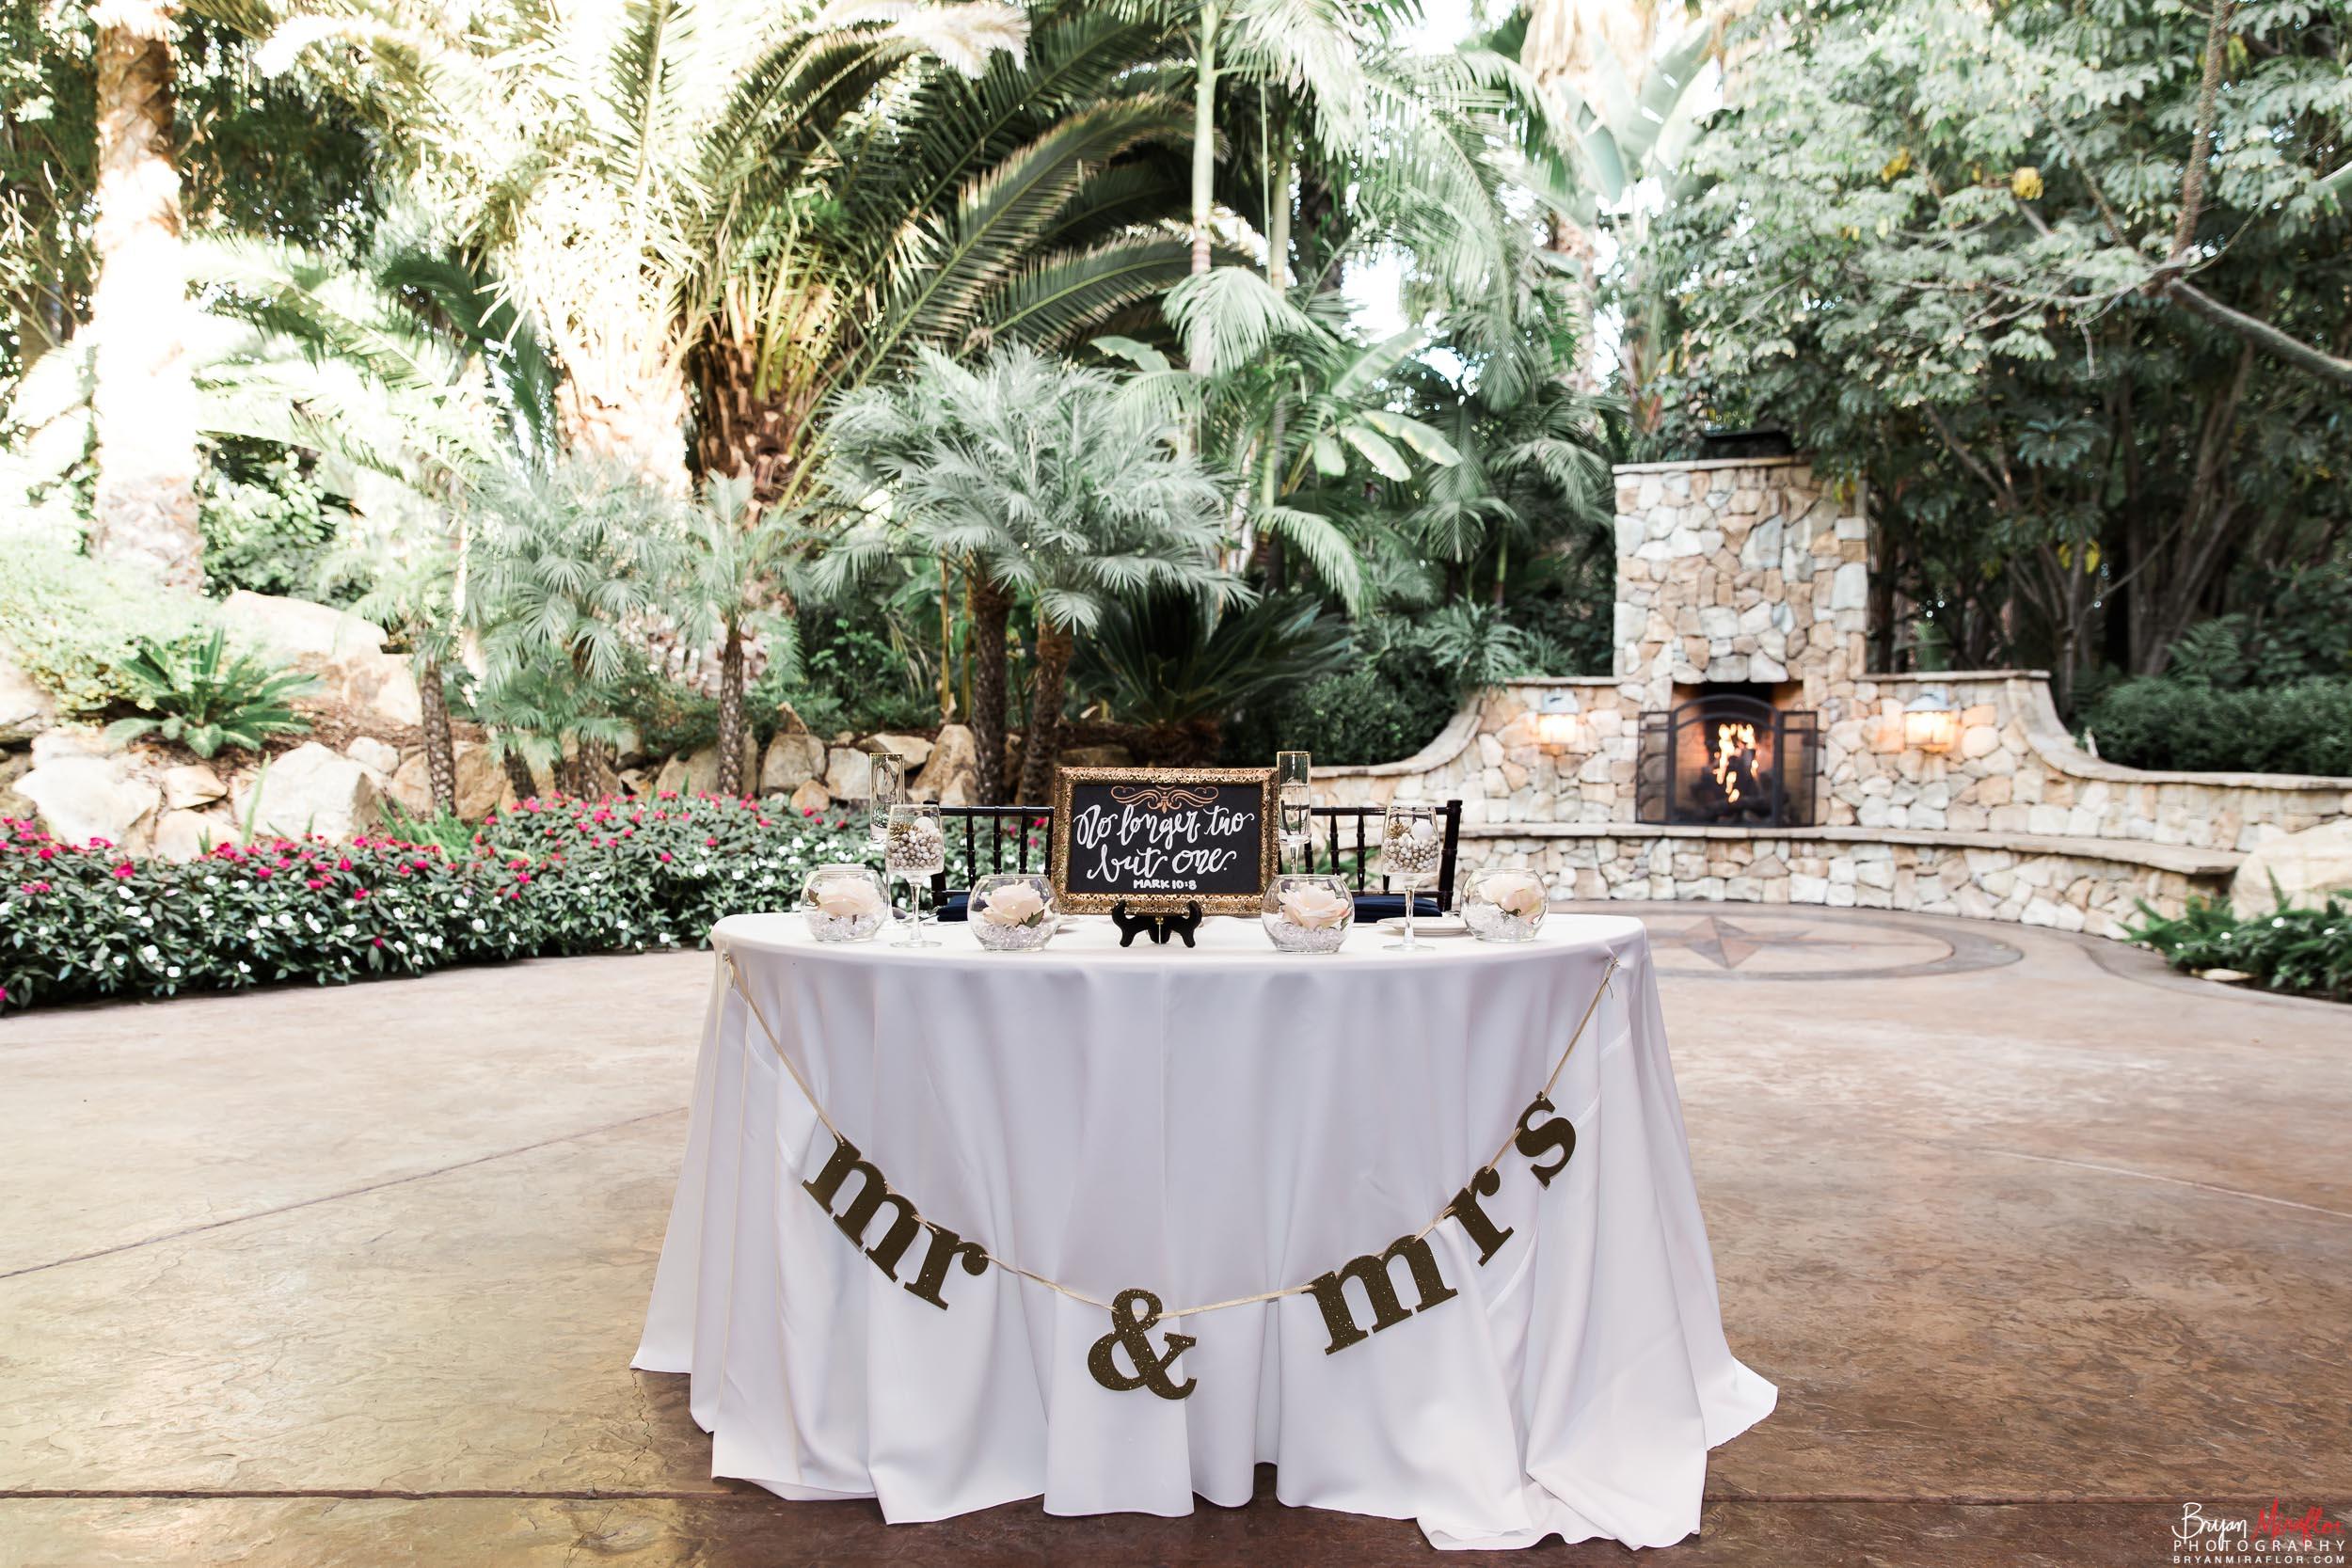 Bryan-Miraflor-Photography-Hannah-Jonathan-Married-Grand-Traditions-Estate-Gardens-Fallbrook-20171222-154.jpg